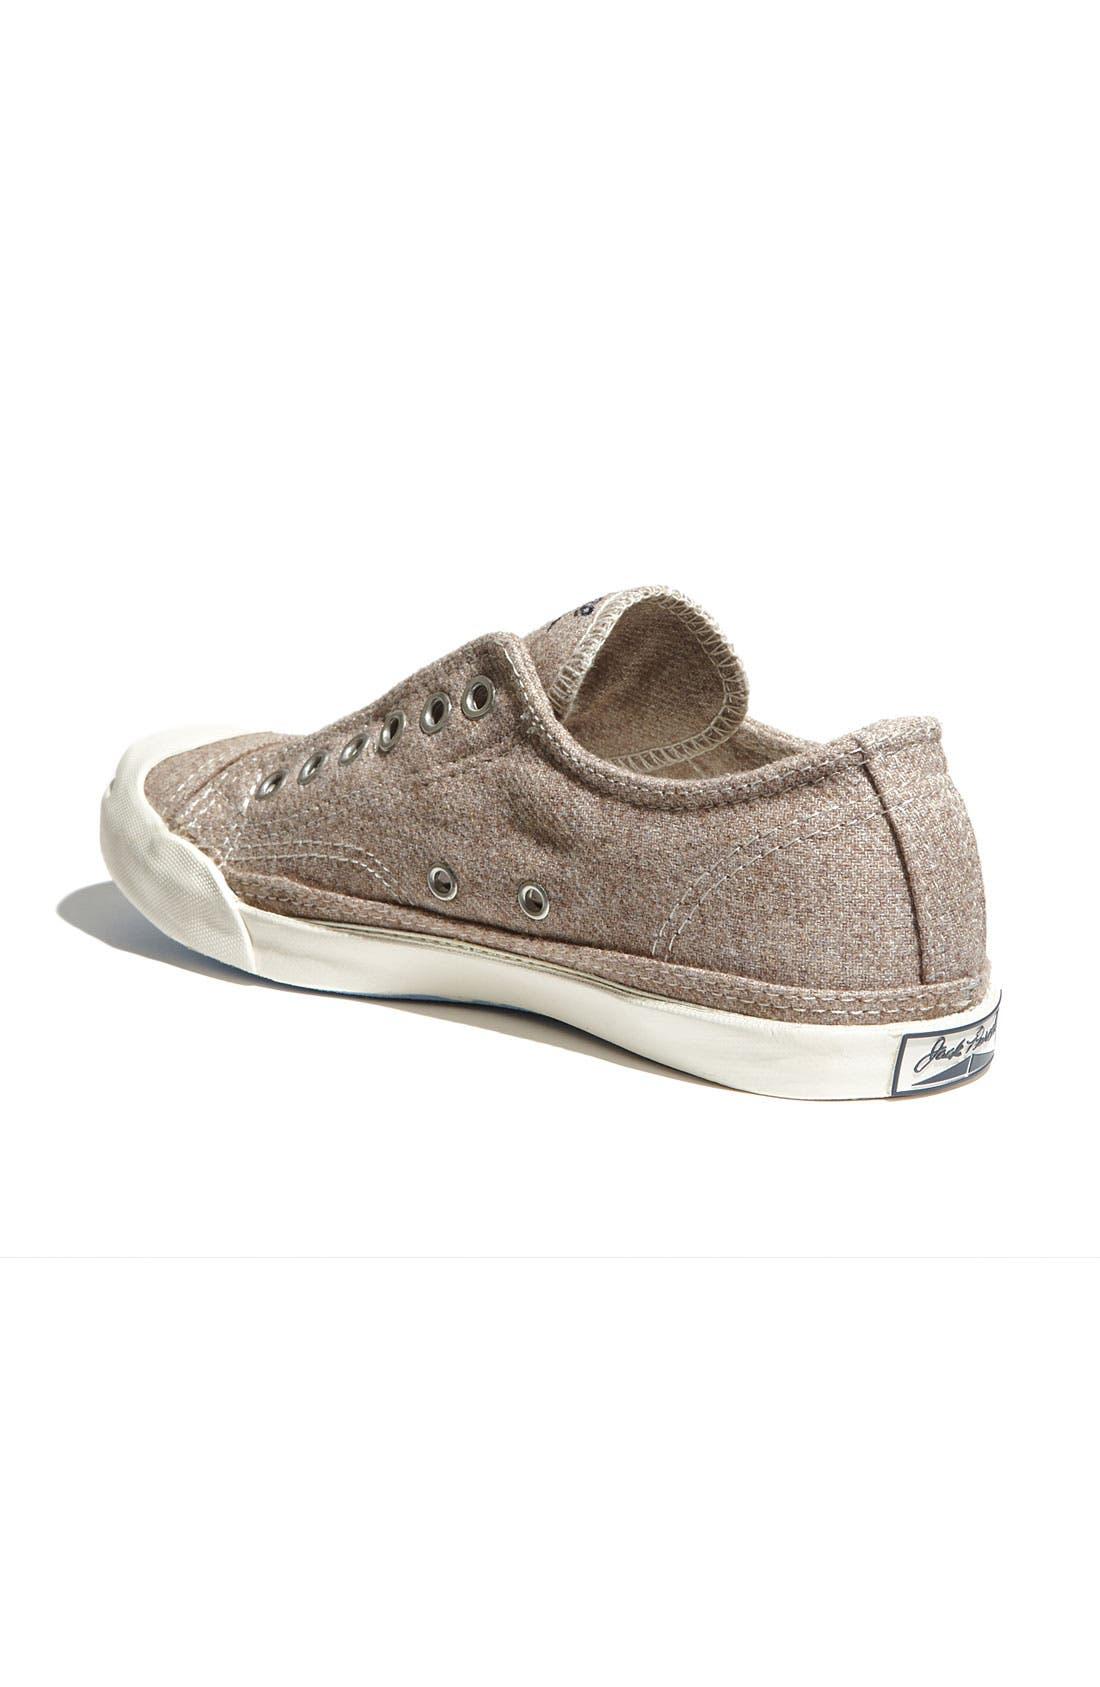 Alternate Image 2  - Converse 'Jack Purcell' Slip-On Sneaker